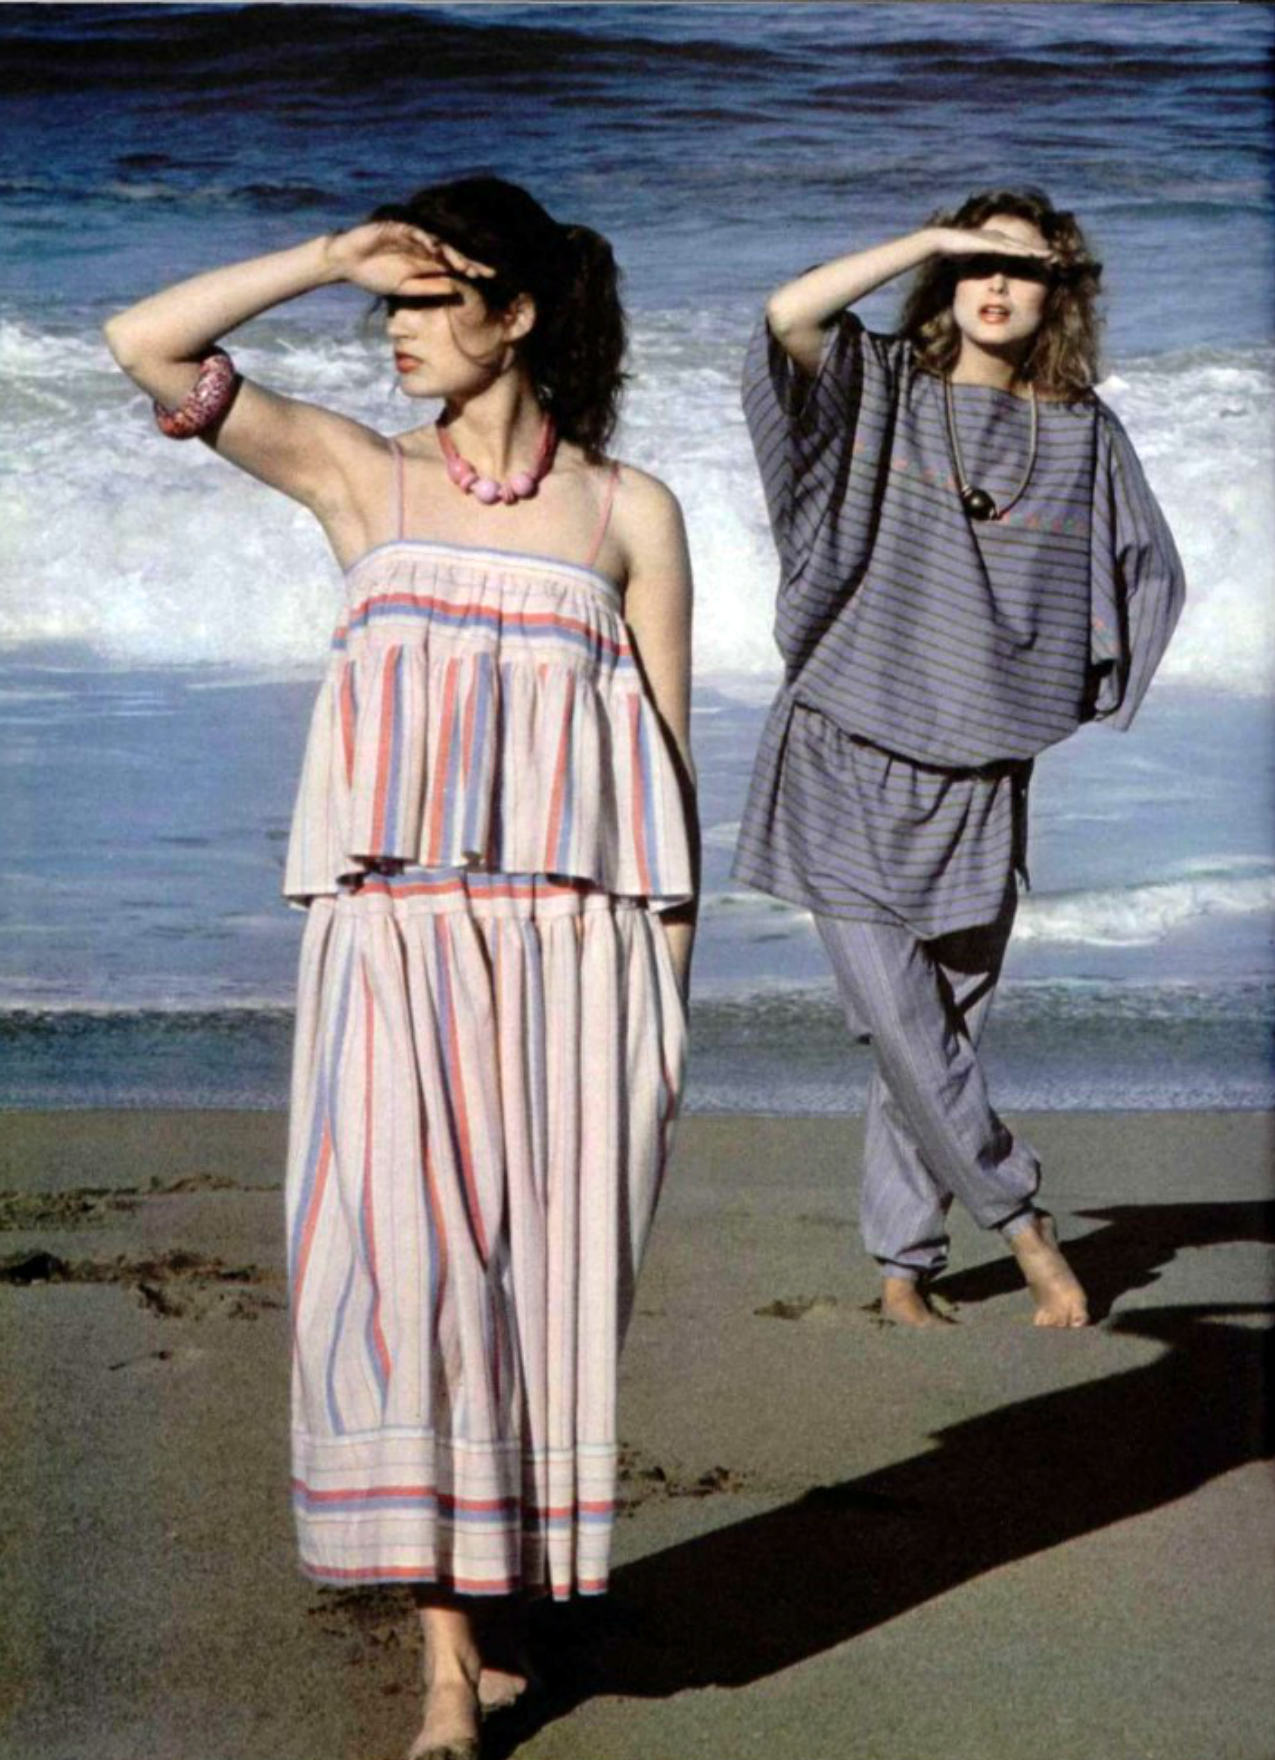 from L'Oficiel magazine, 1979